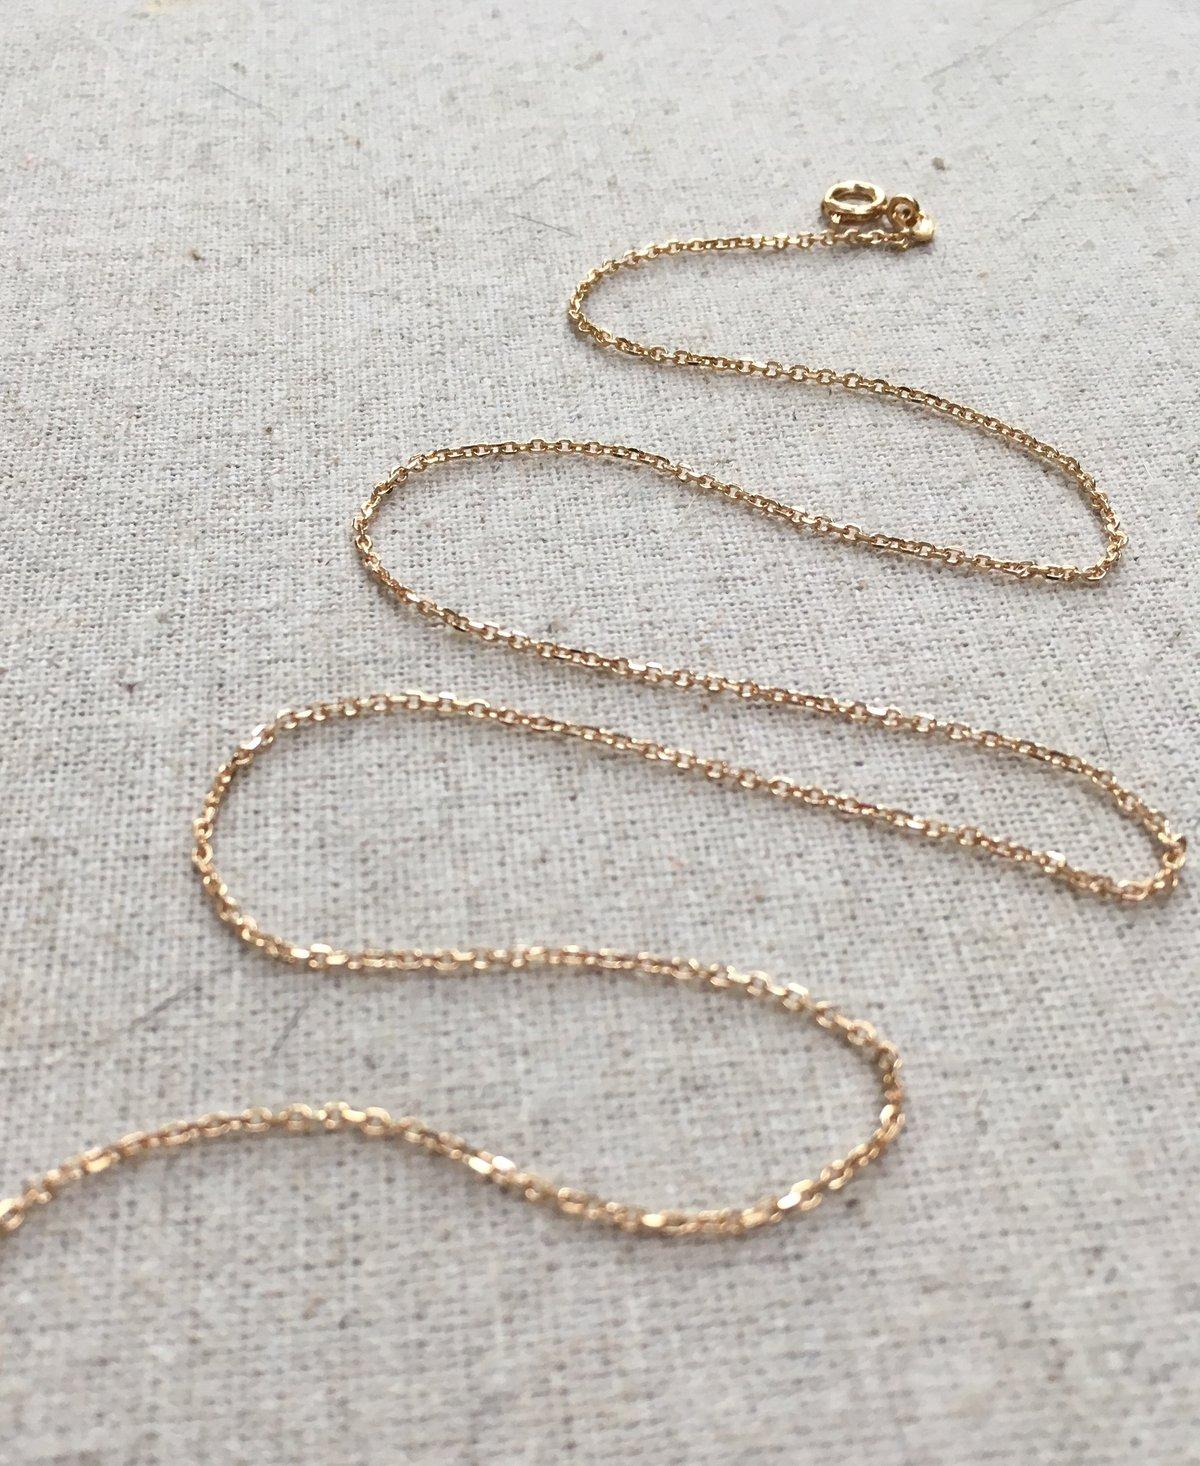 Image of Chaine 45 cm